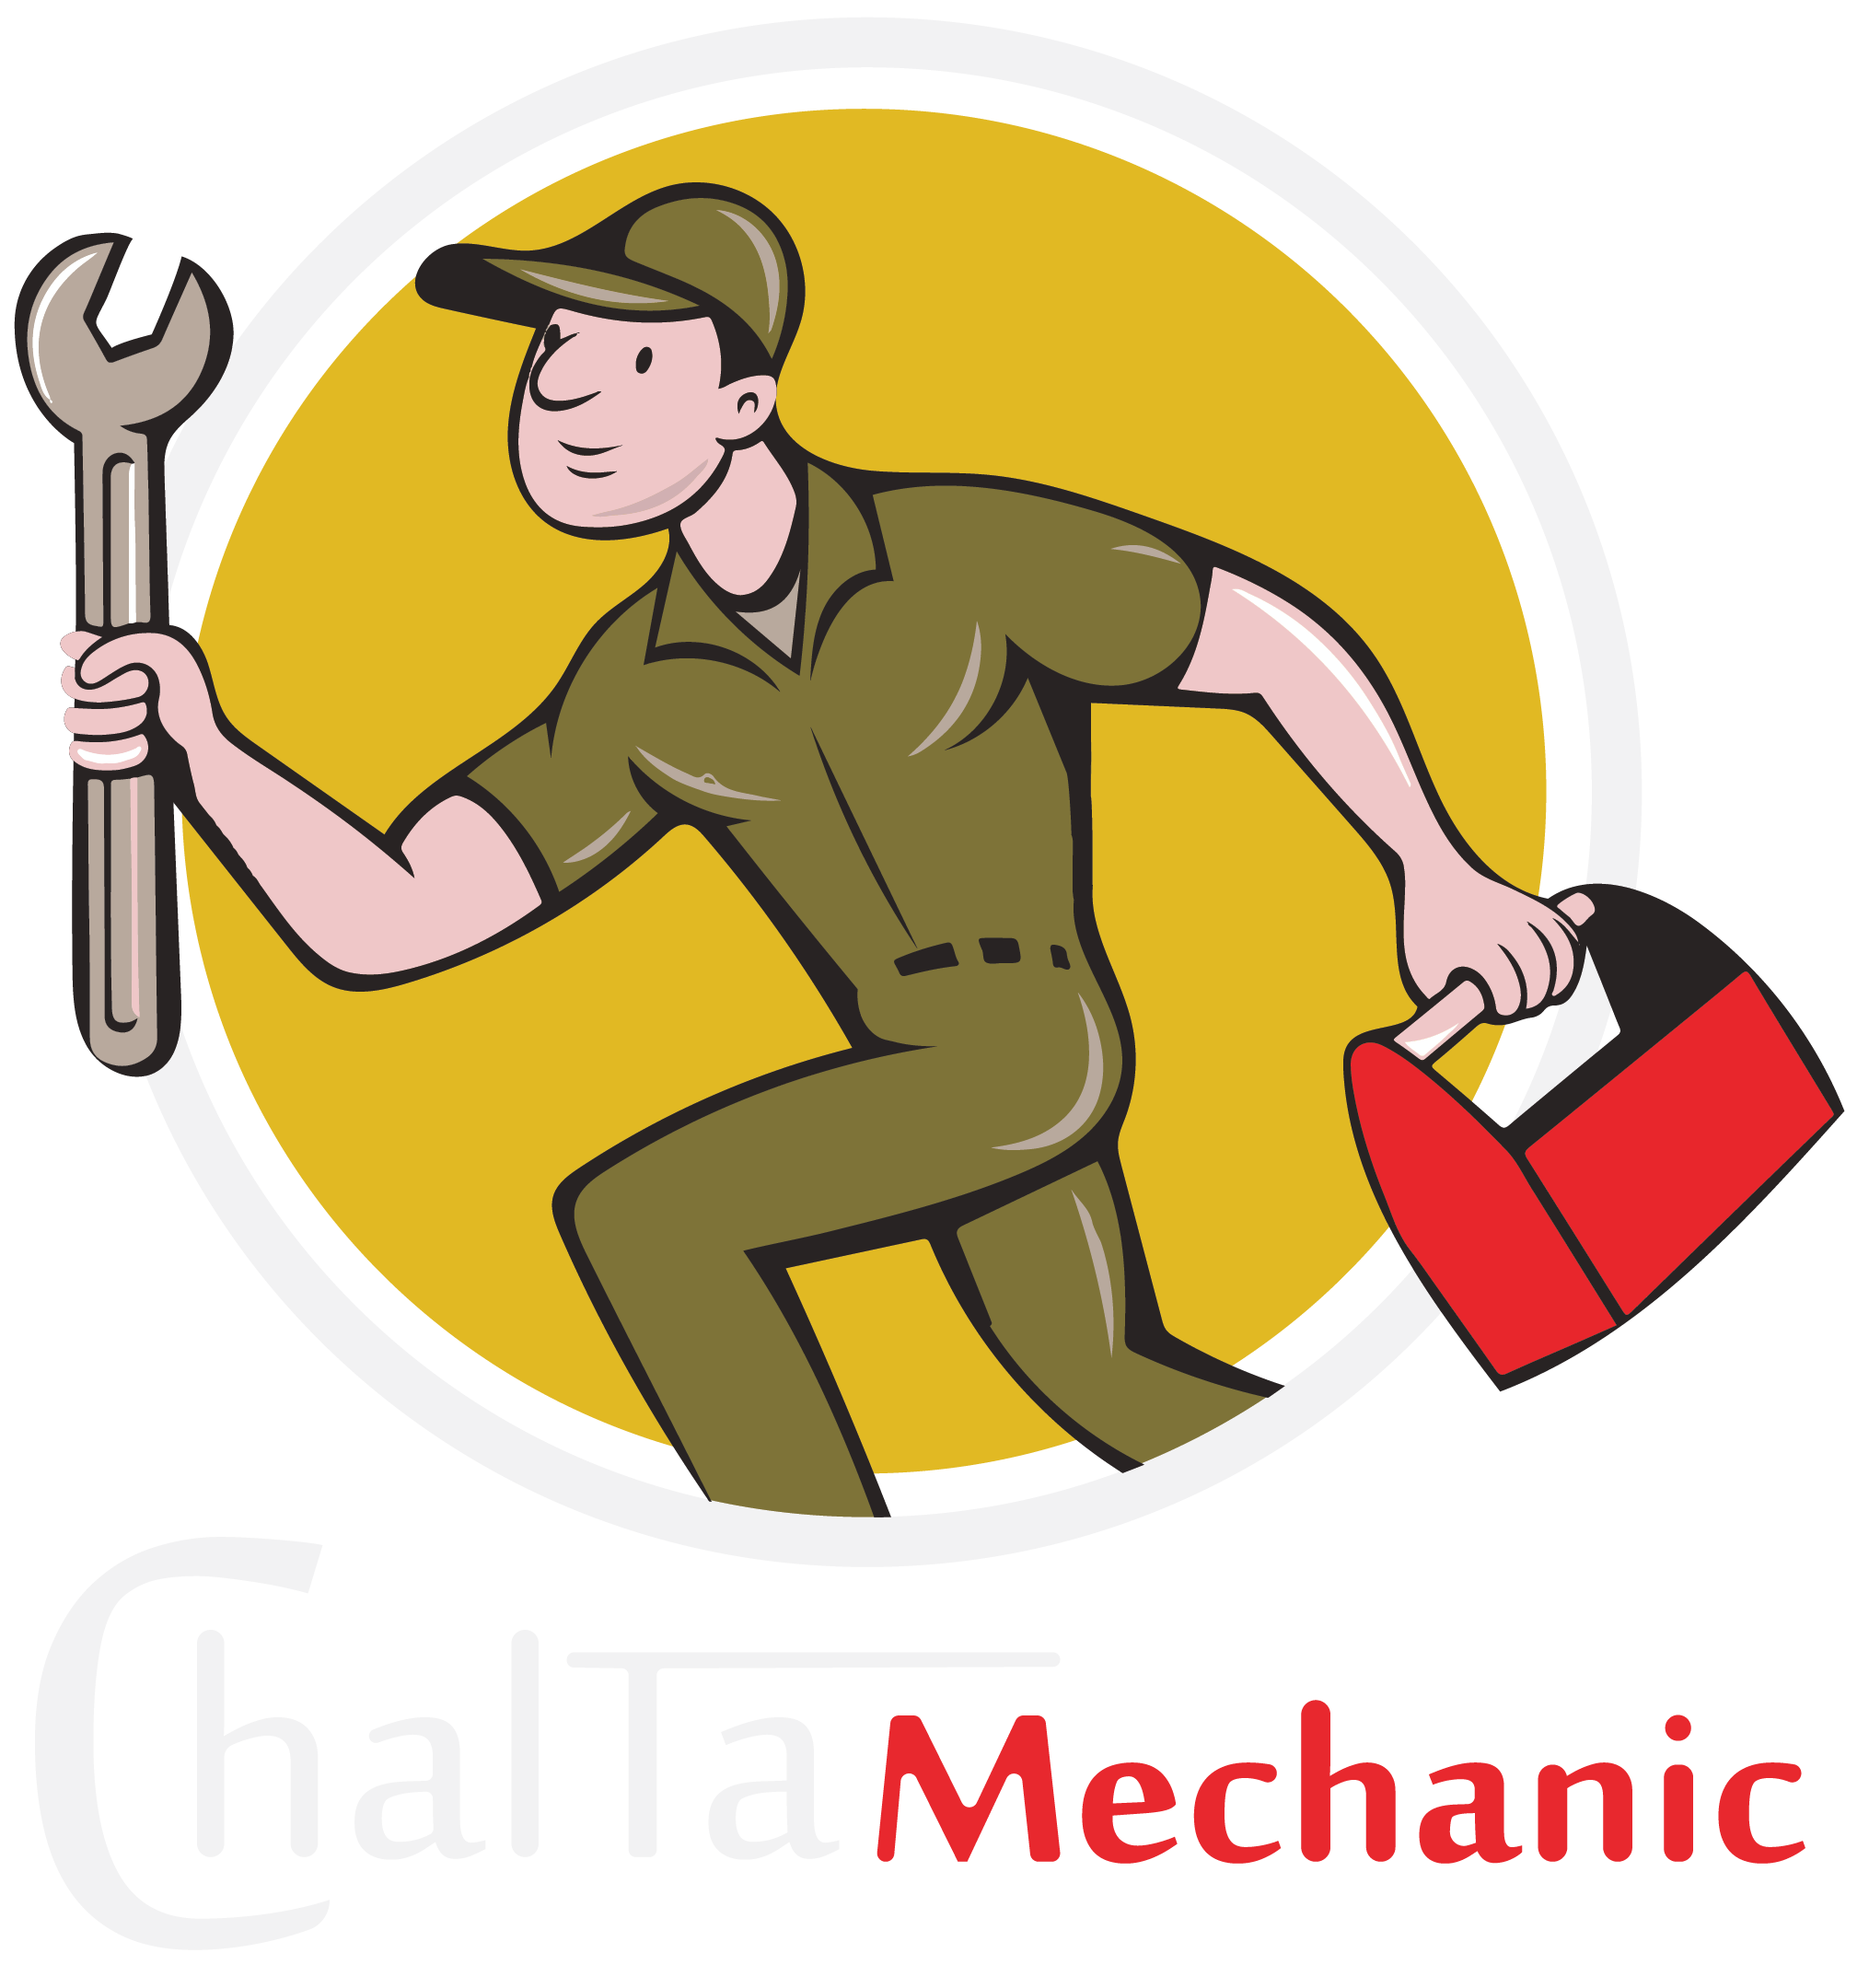 Mechanic clipart mechanical work. Chalta car and bike